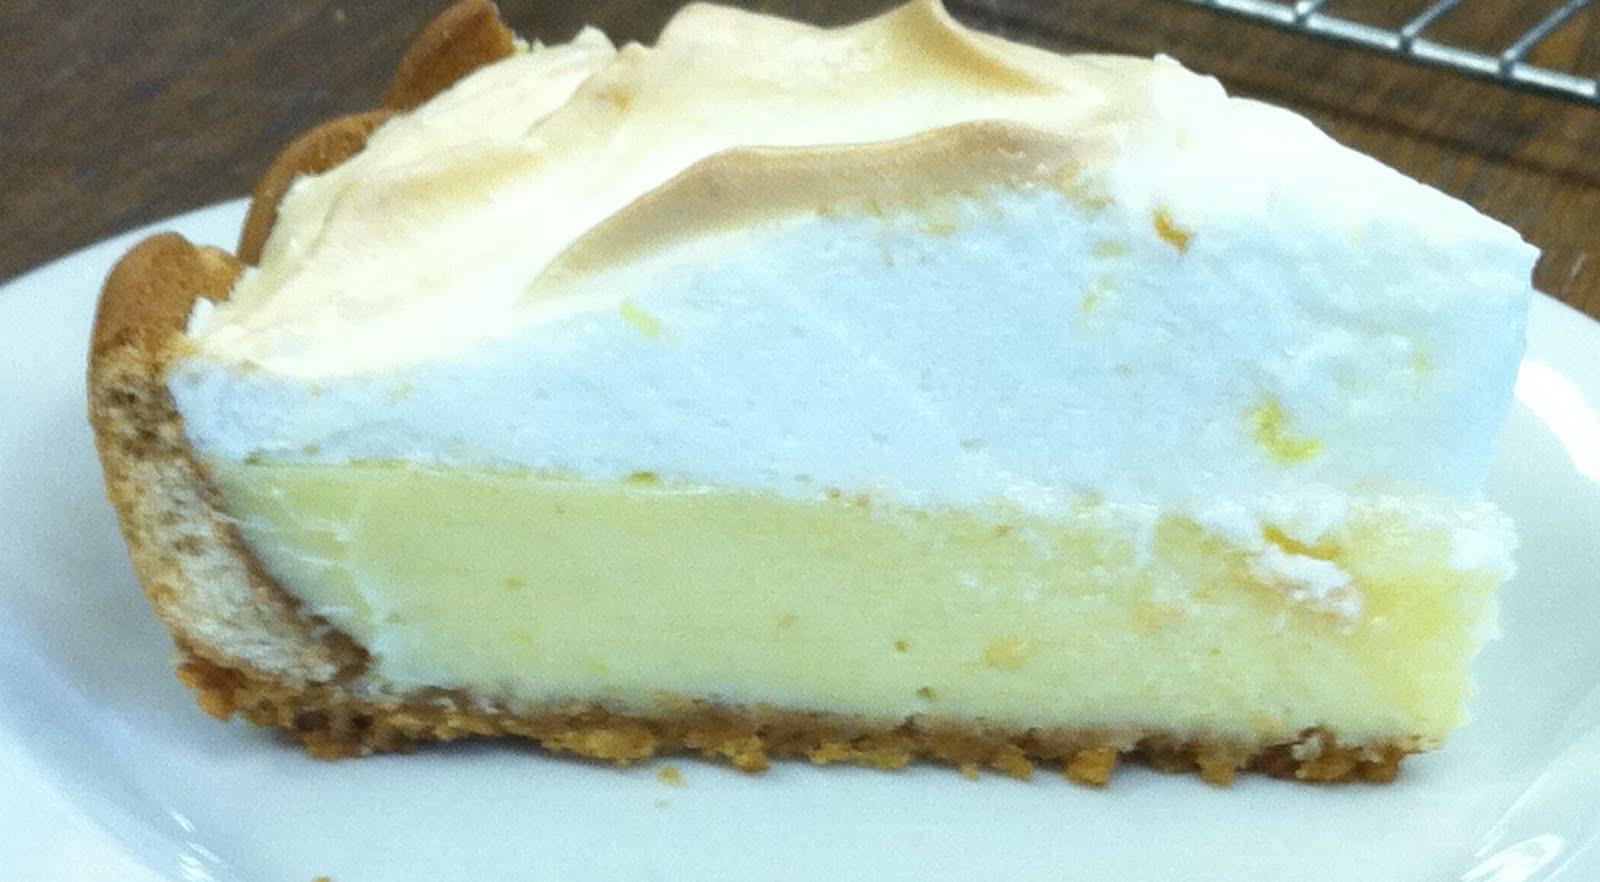 Discover foods national pi e day for Lemon meringue pie with graham cracker crust